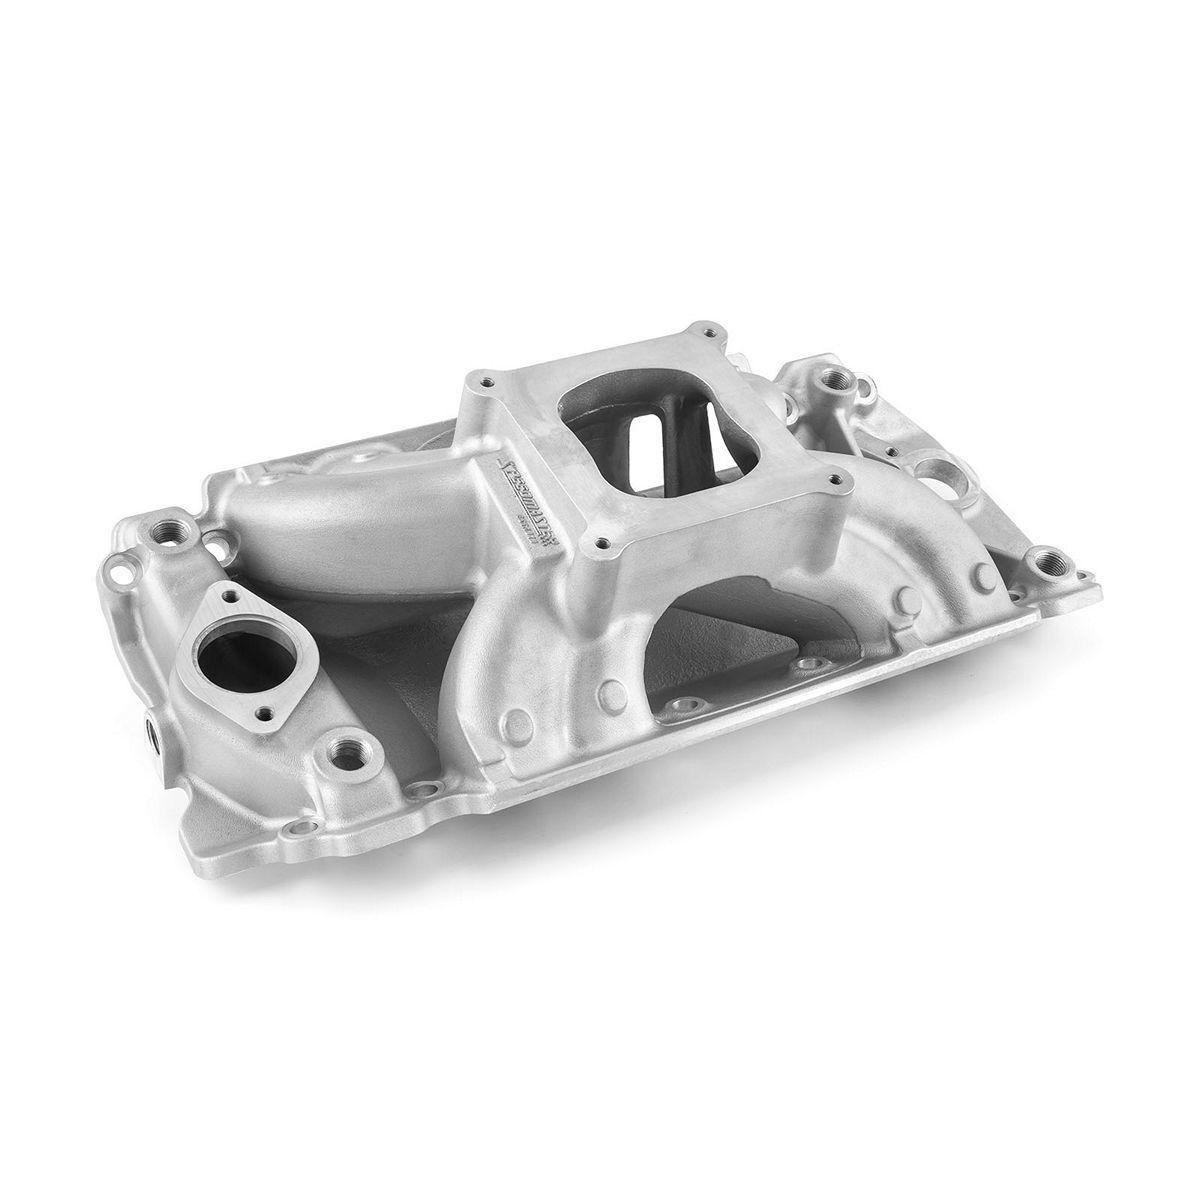 Speedmaster 1-147-022 Intake Manifold, HiRise, Square Bore, Single Plane, Rectangle Port, Aluminum, Natural, Big Block Chevy, Each